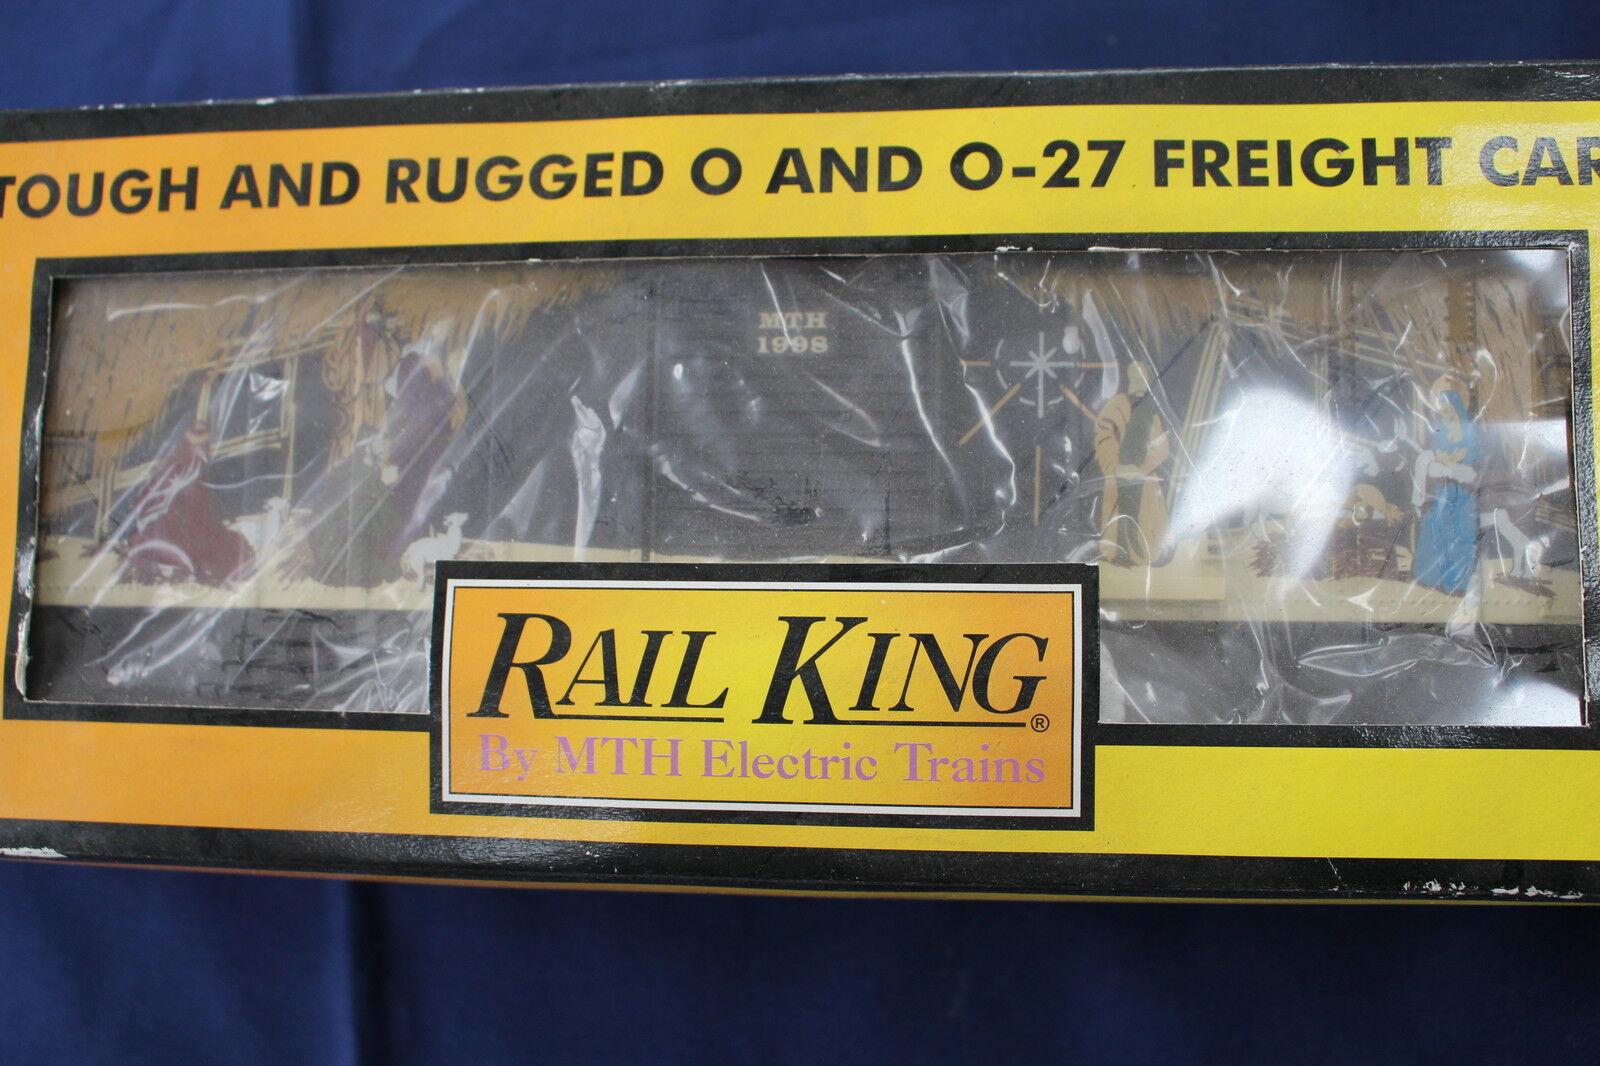 1998 Rail King by MTH Holiday Box Car L2957